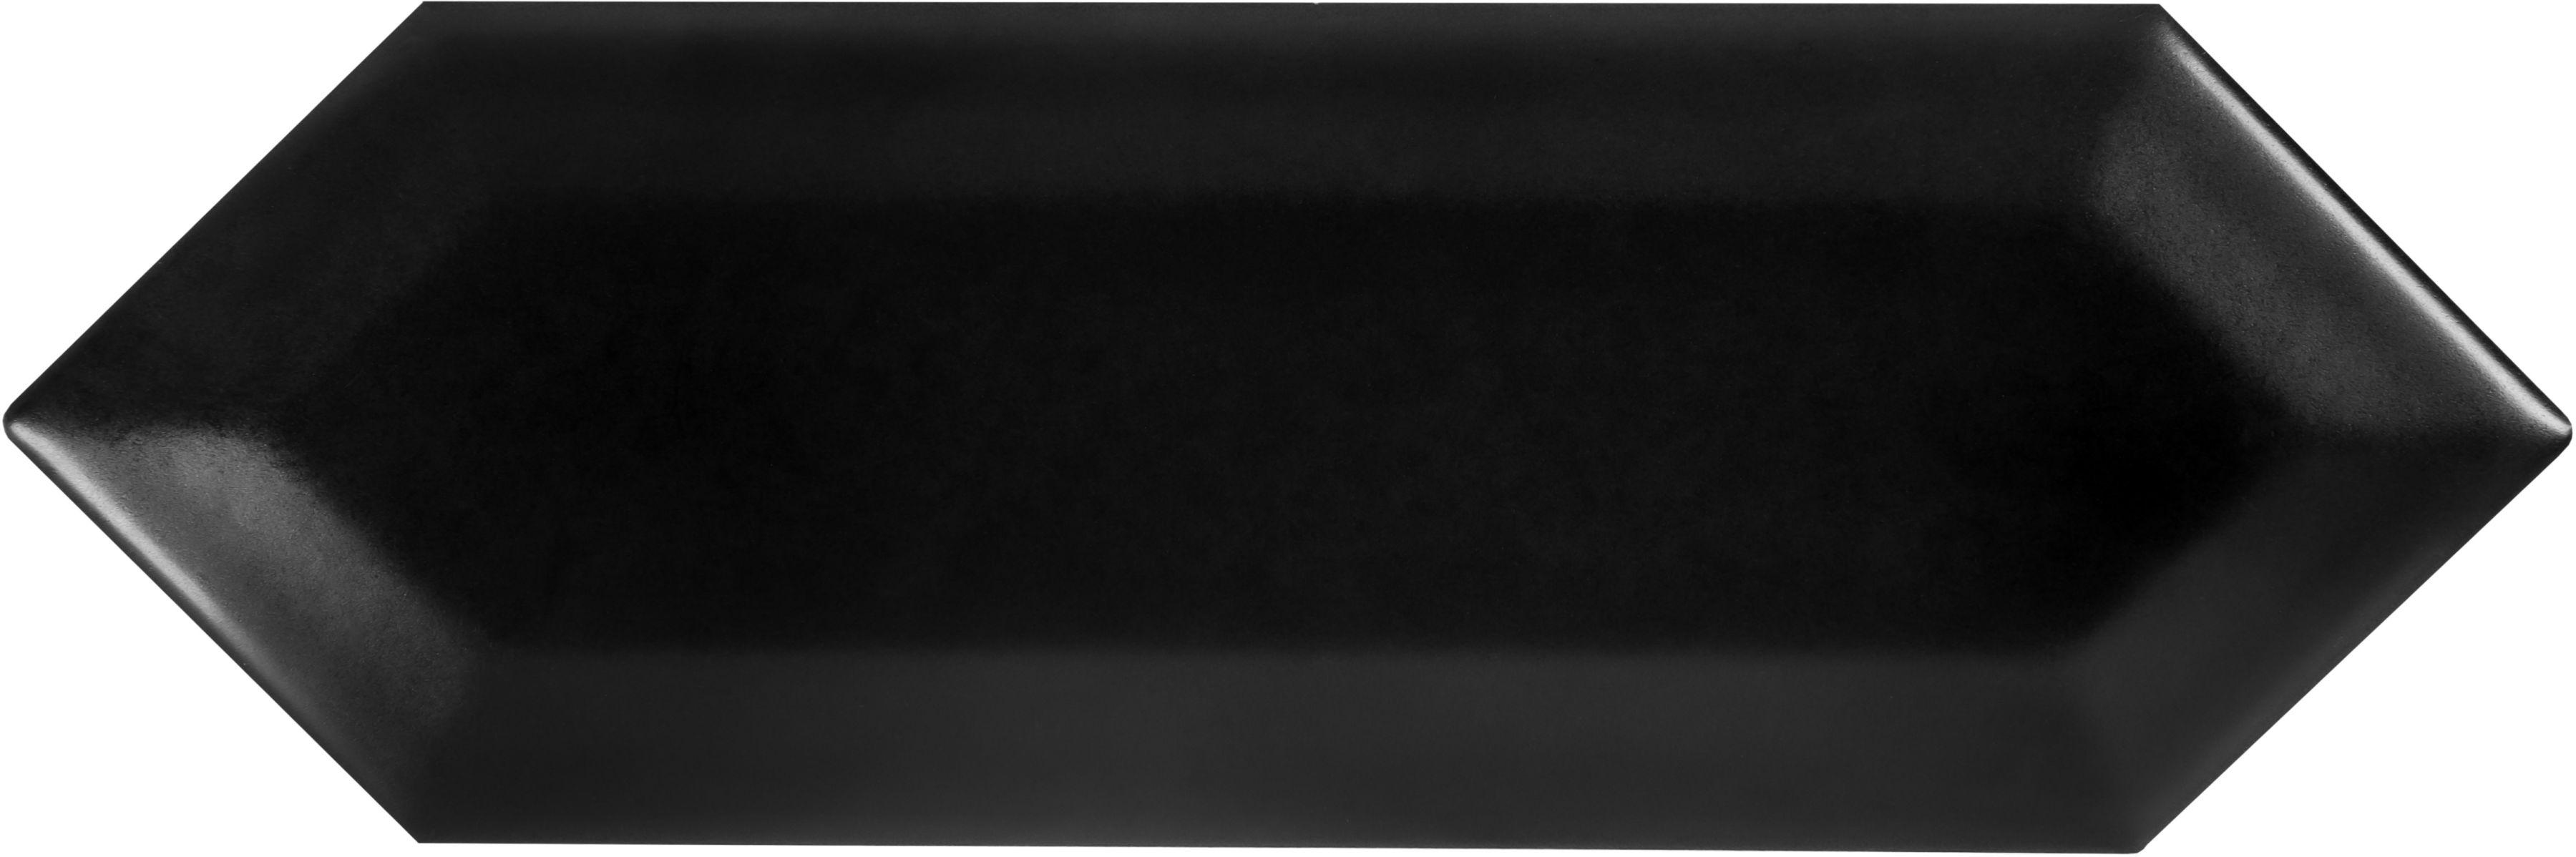 Dunin Tritone Black Matt 03 7,5x22,7 płytka ścienna